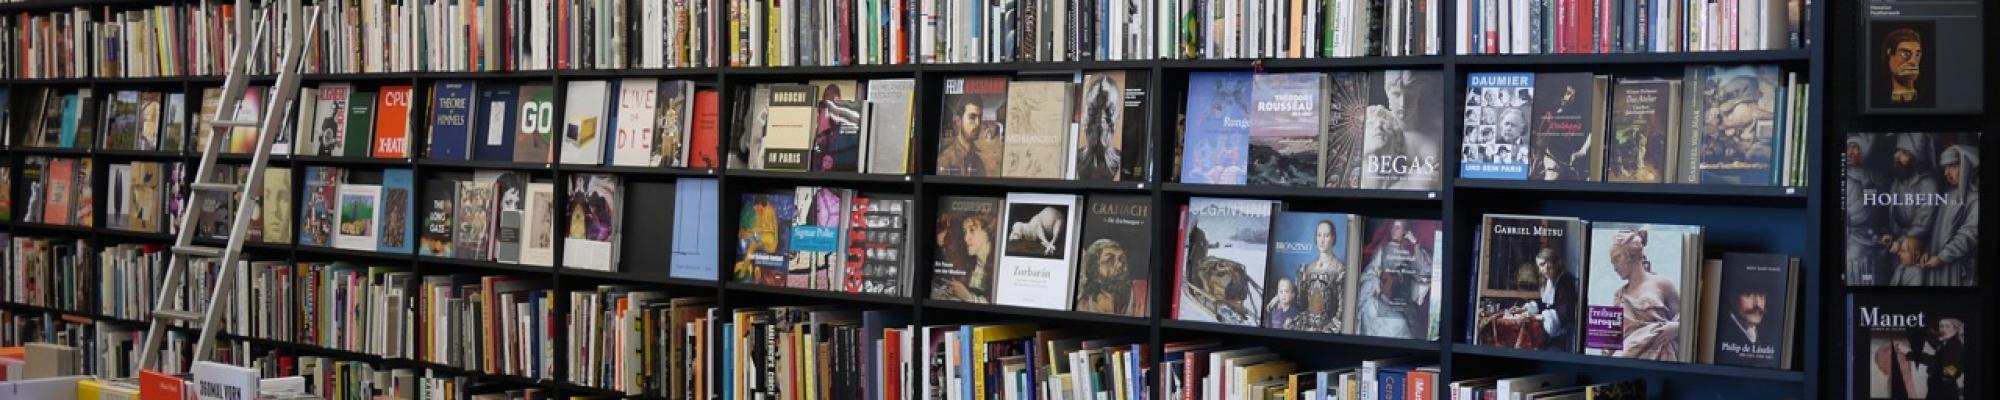 Kunstboekhandels